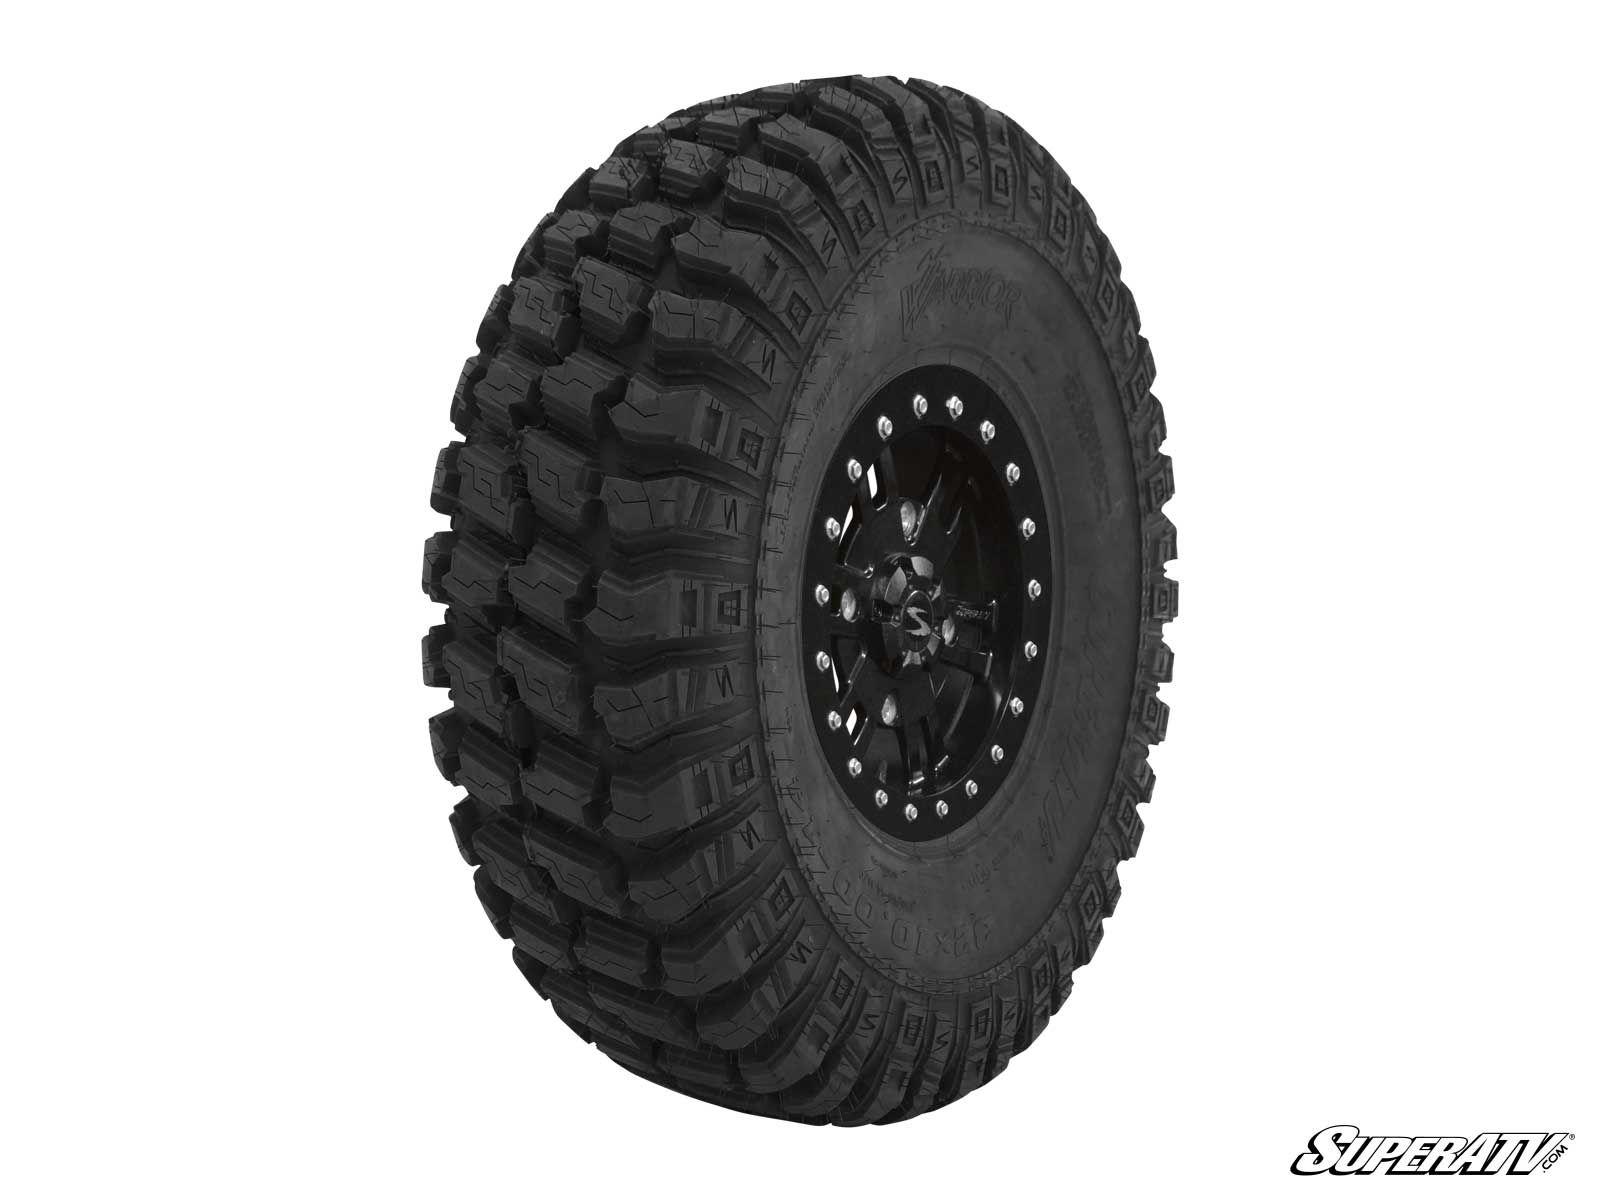 32x10 14 at warrior tires sticky compound msc powersports. Black Bedroom Furniture Sets. Home Design Ideas